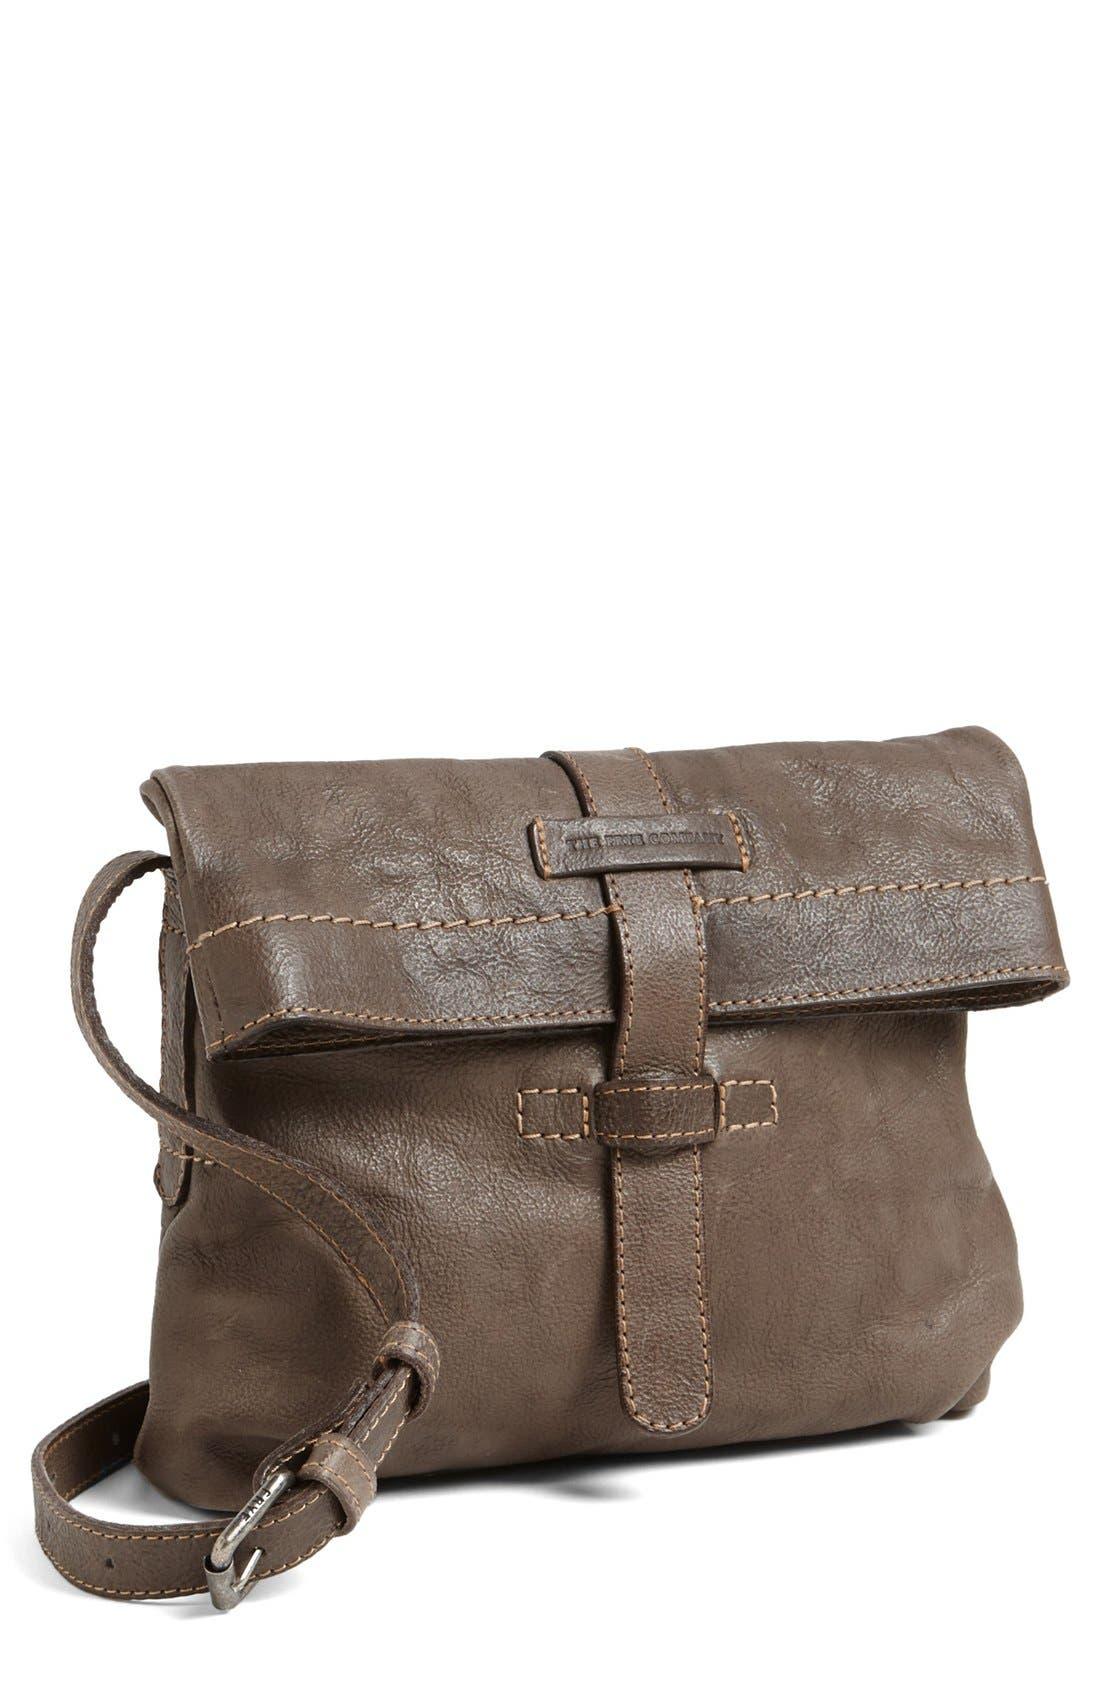 Main Image - Frye 'Artisan Foldover' Leather Crossbody Bag